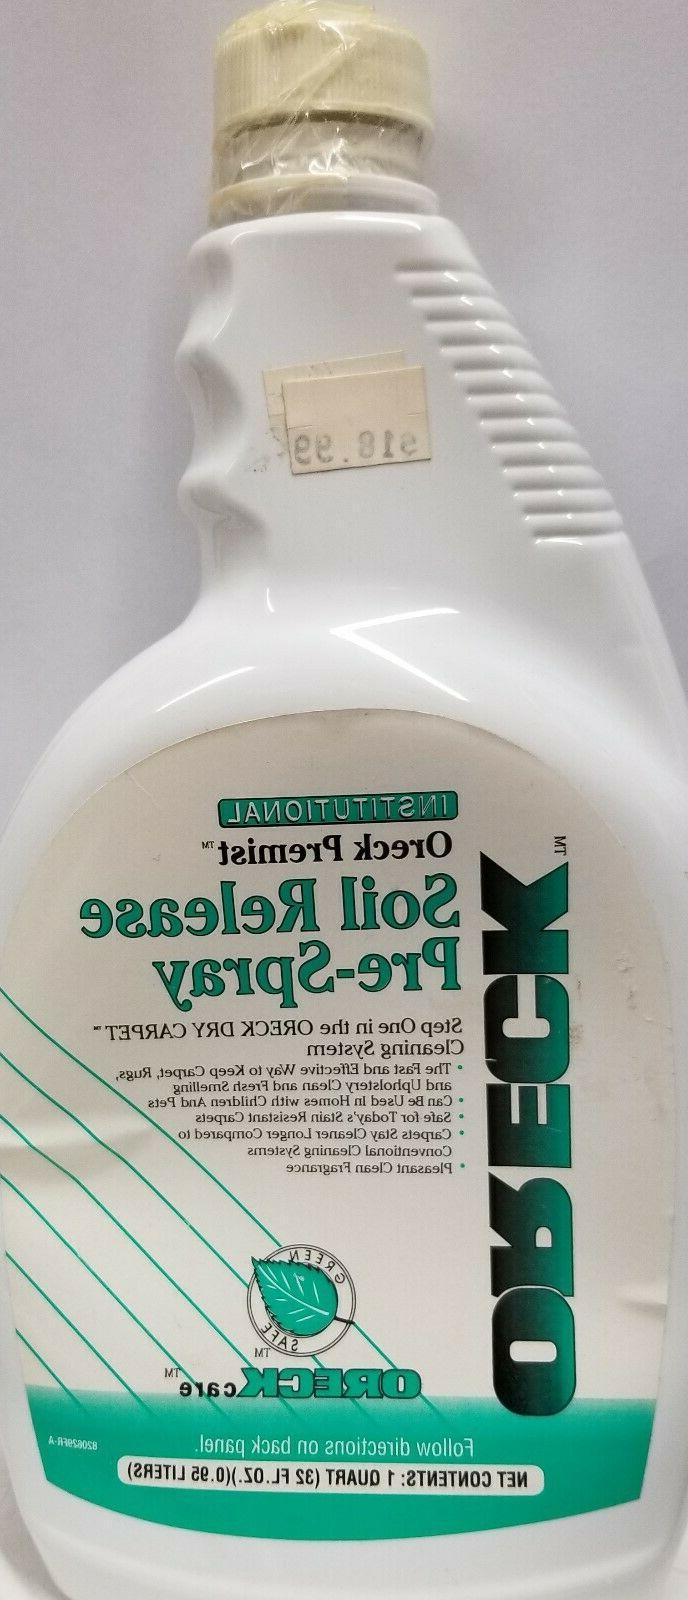 premist soil release pre sray